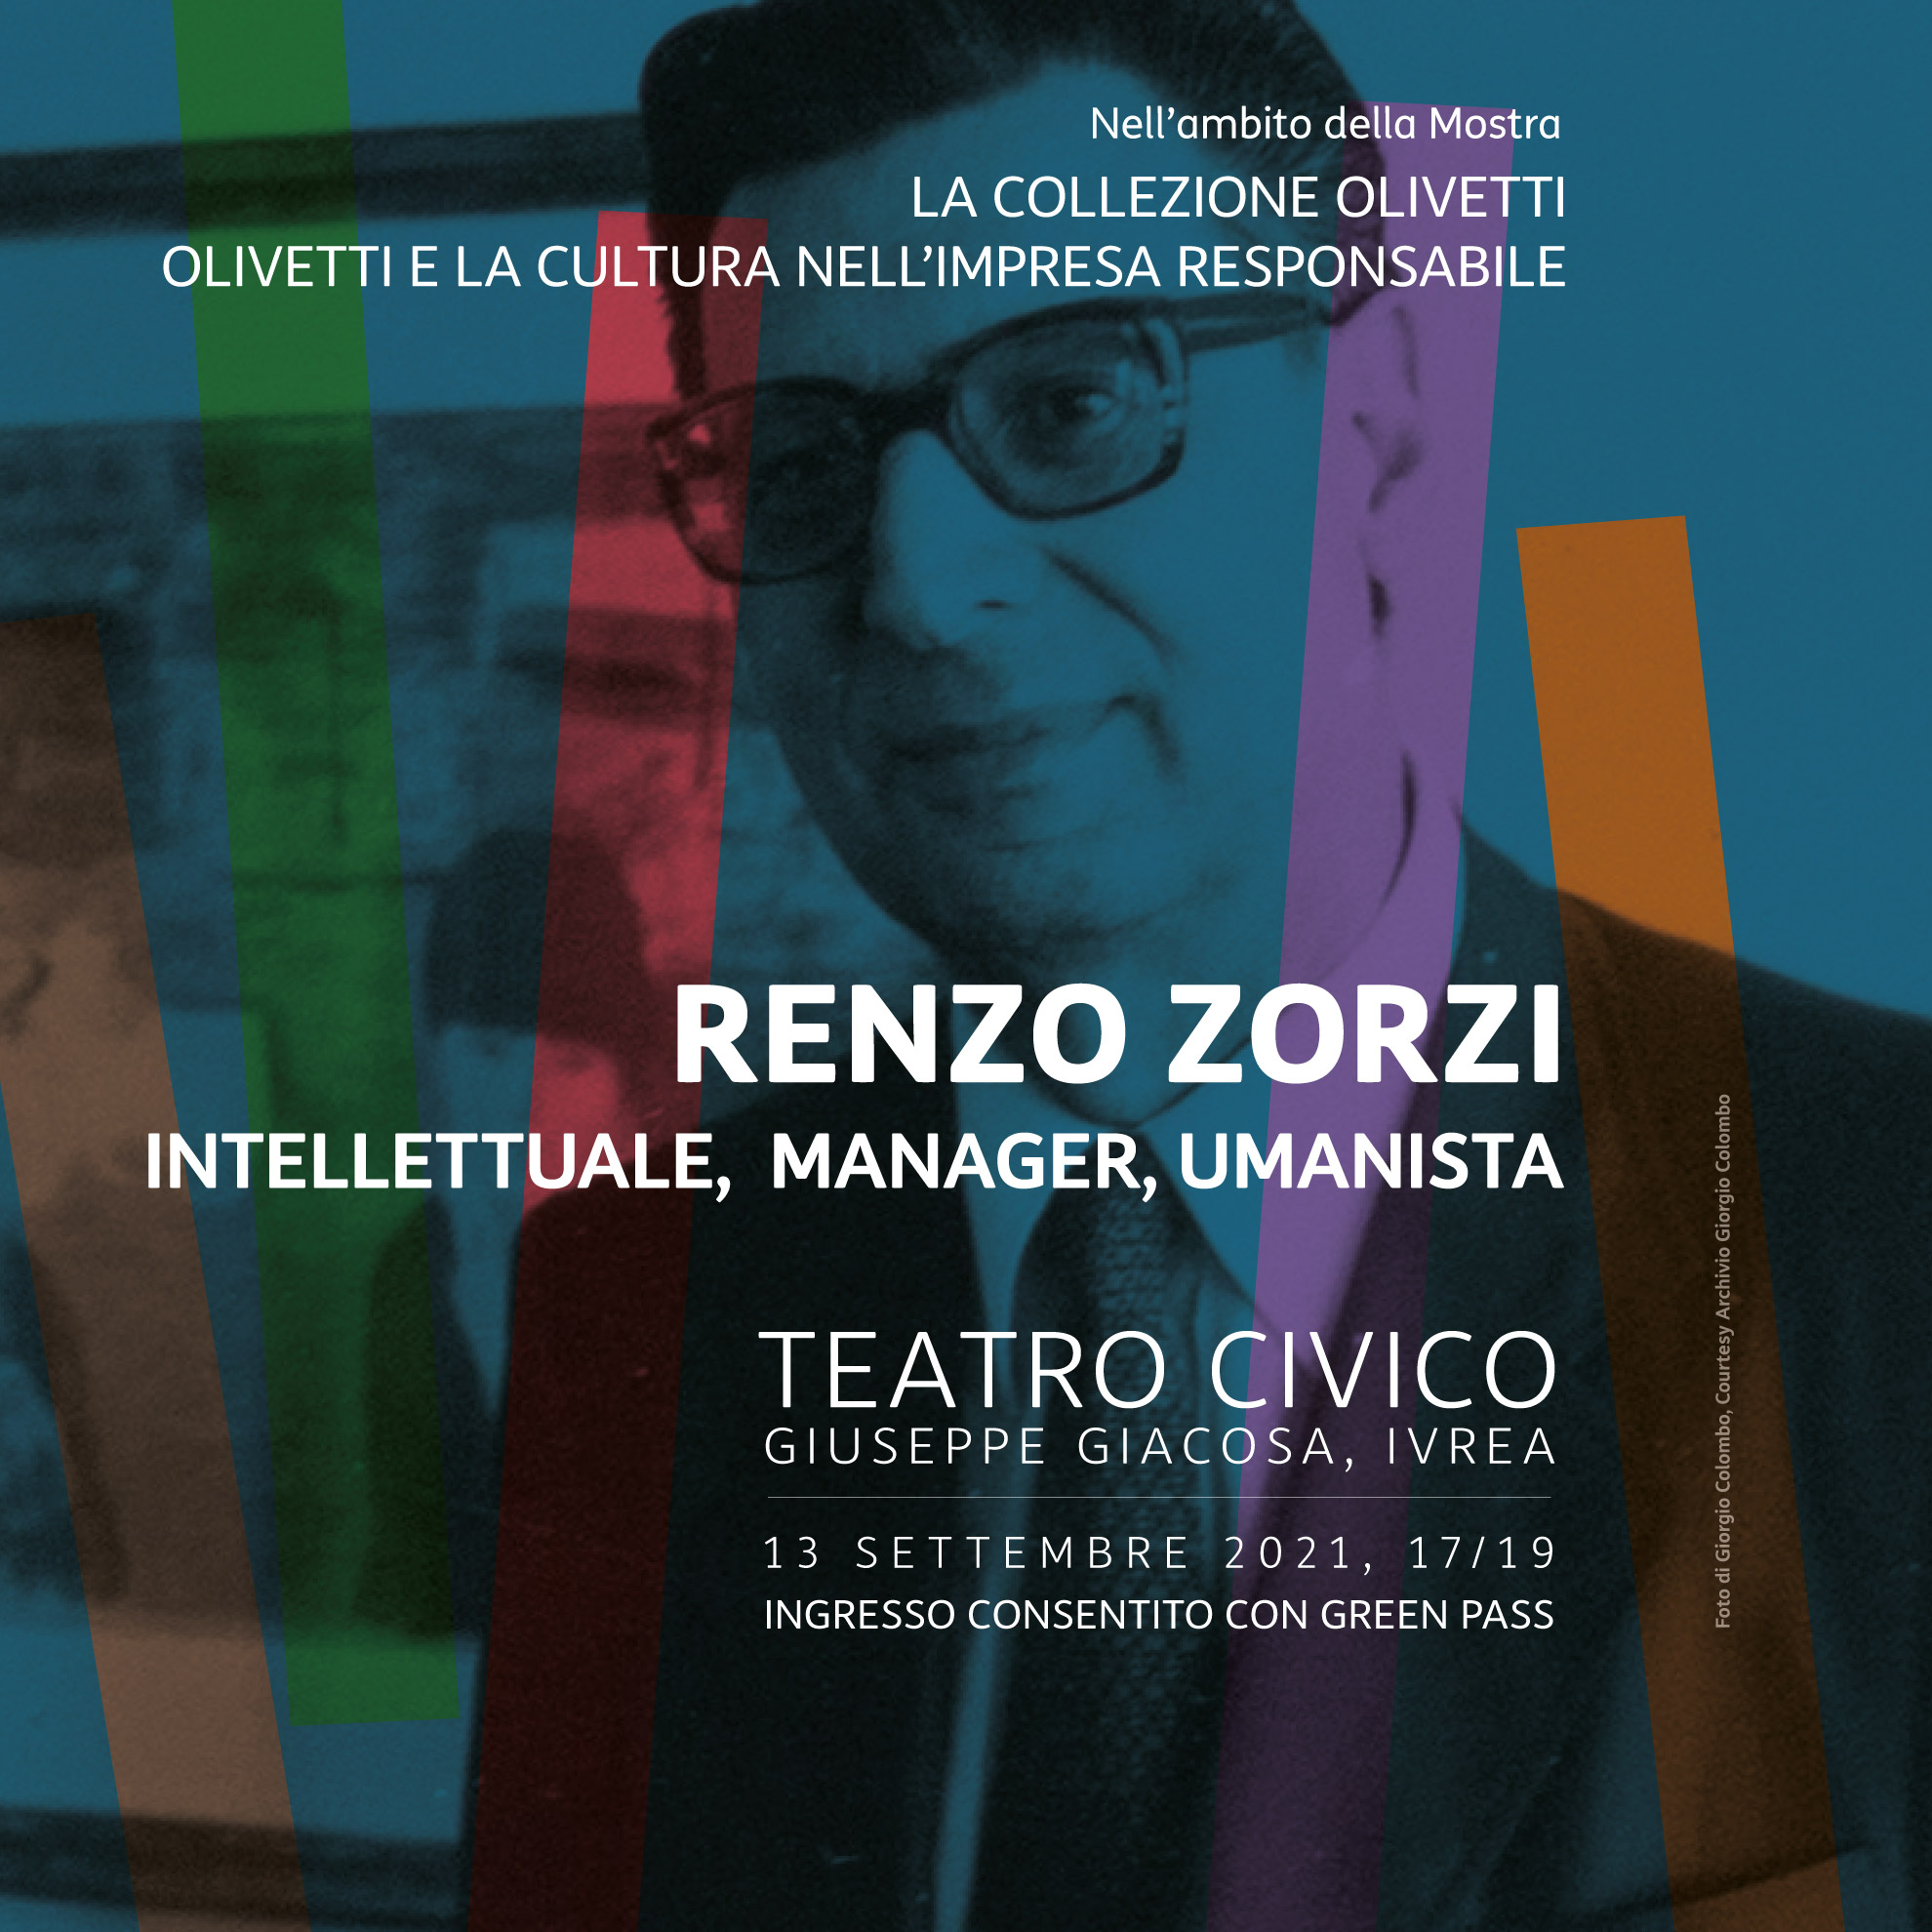 Renzo Zorzi. Intellettuale, manager, umanista